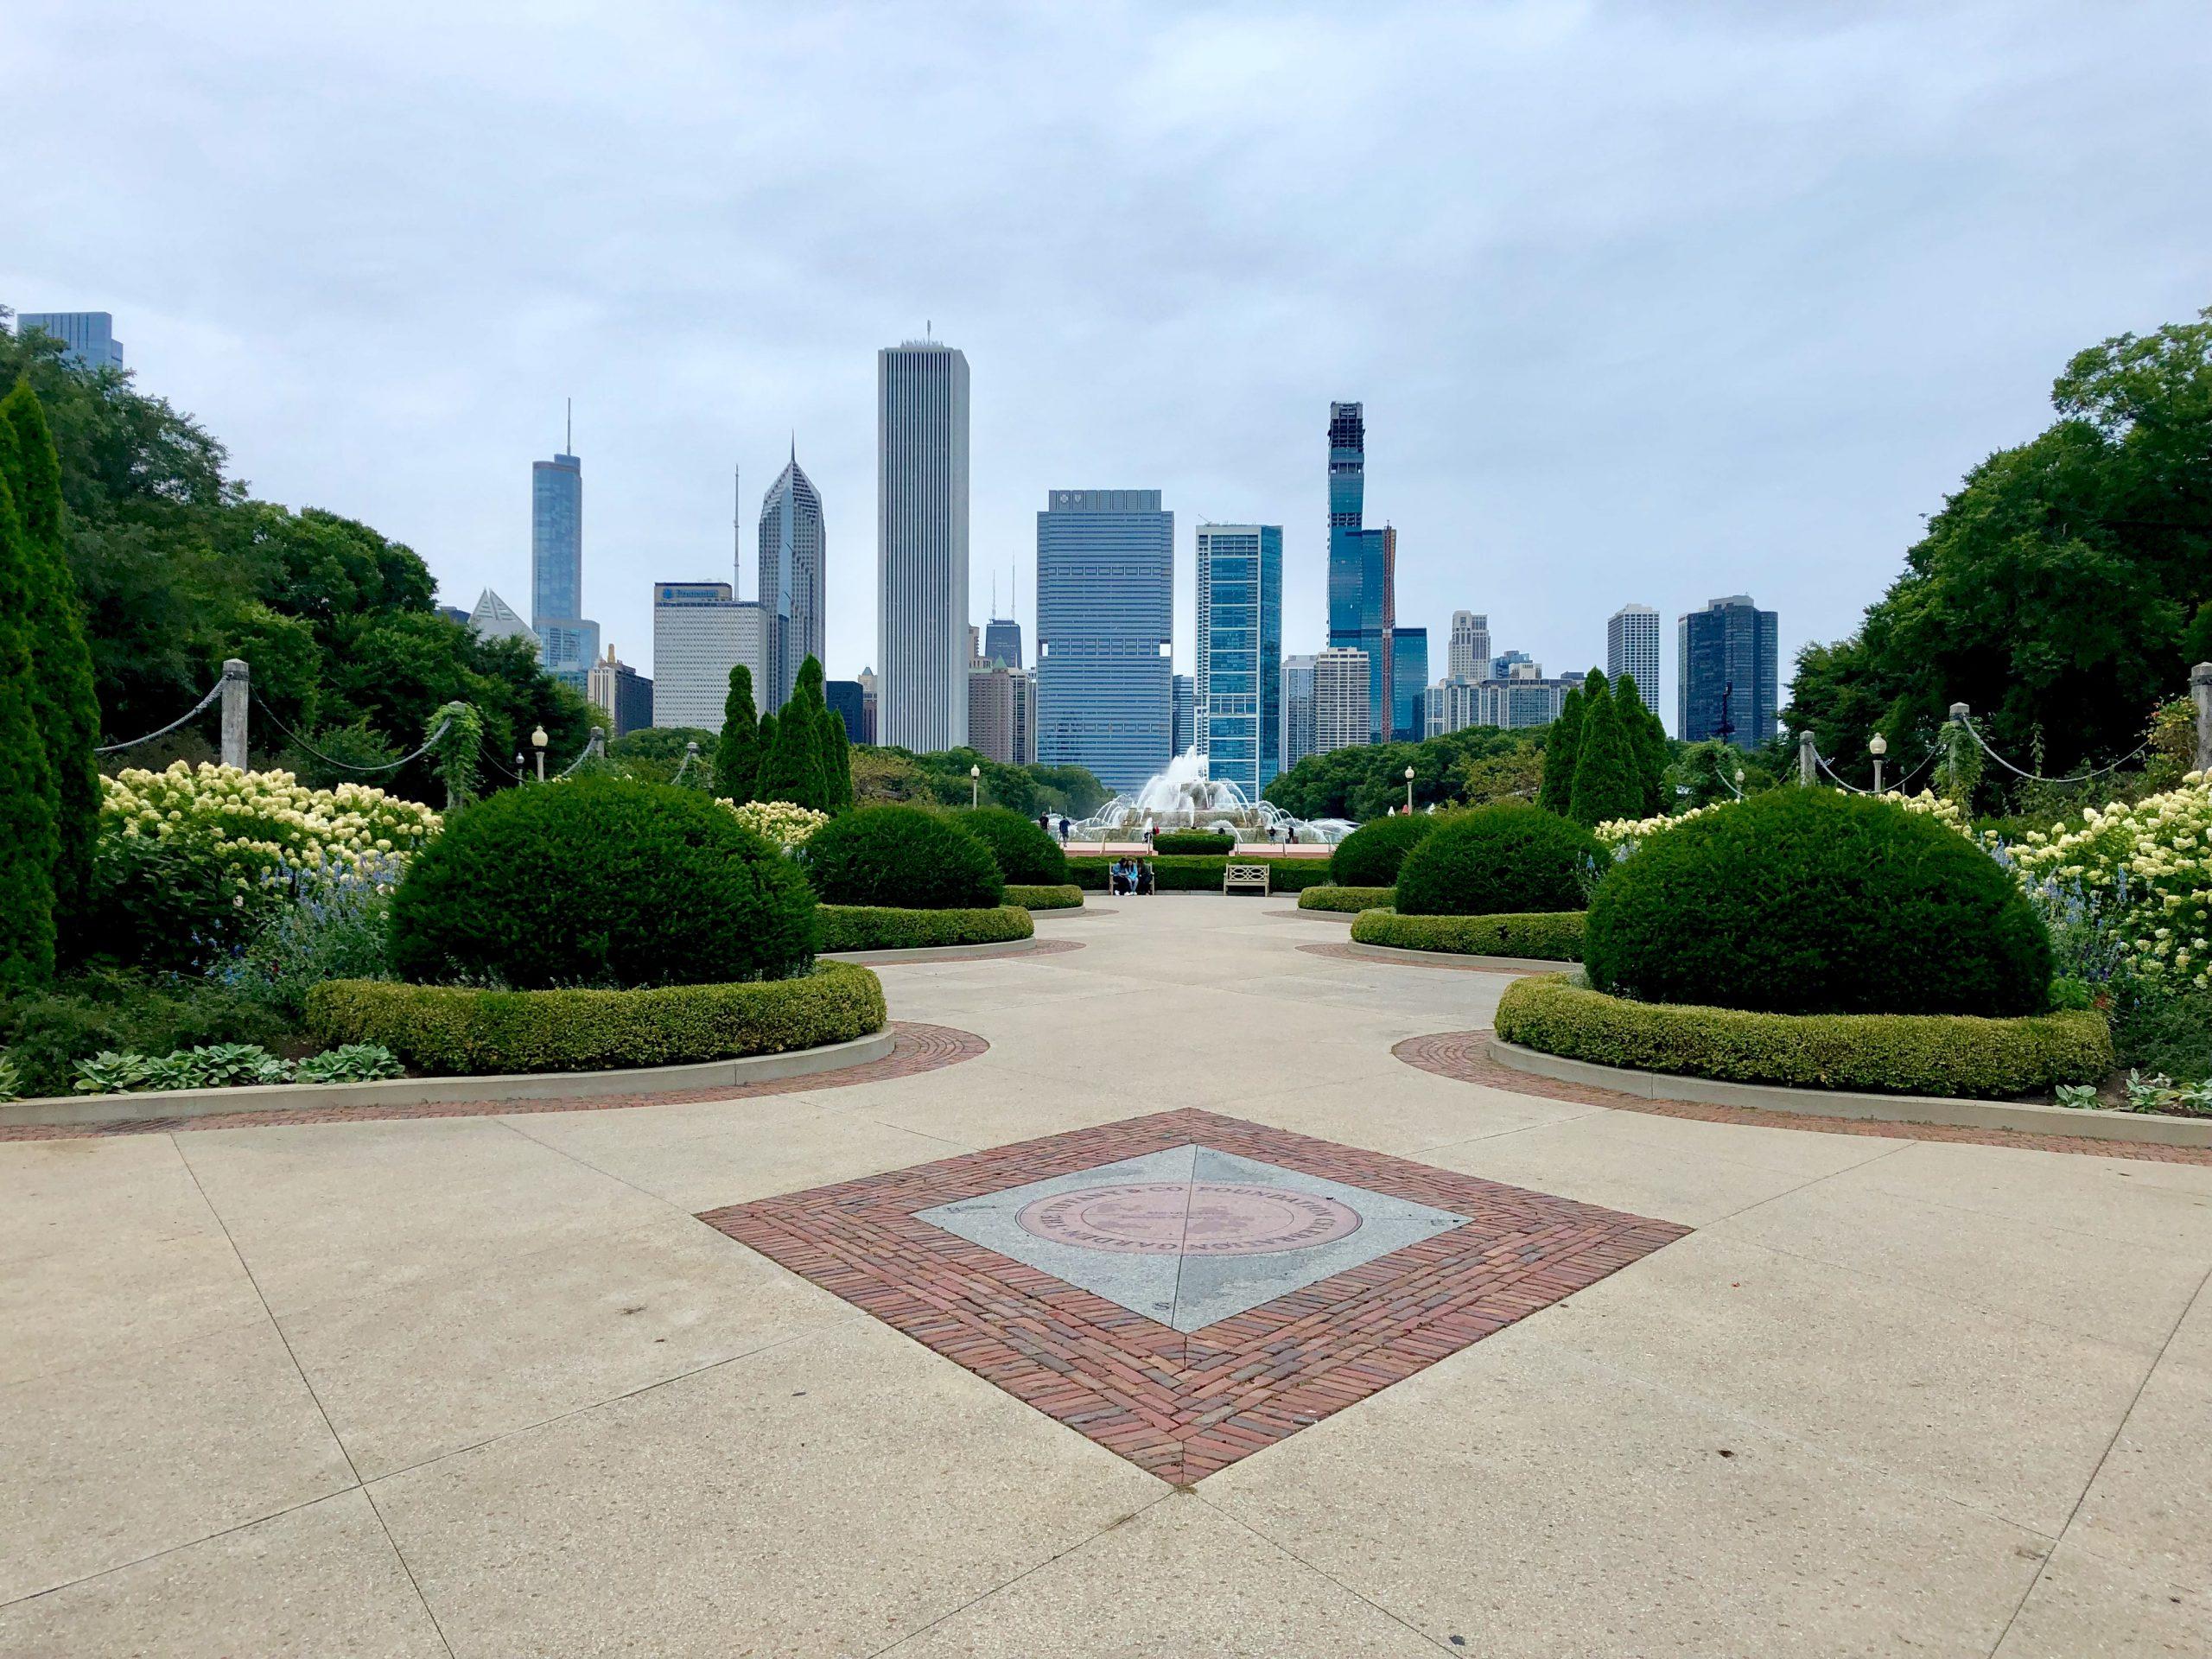 tiffany jardines chicago